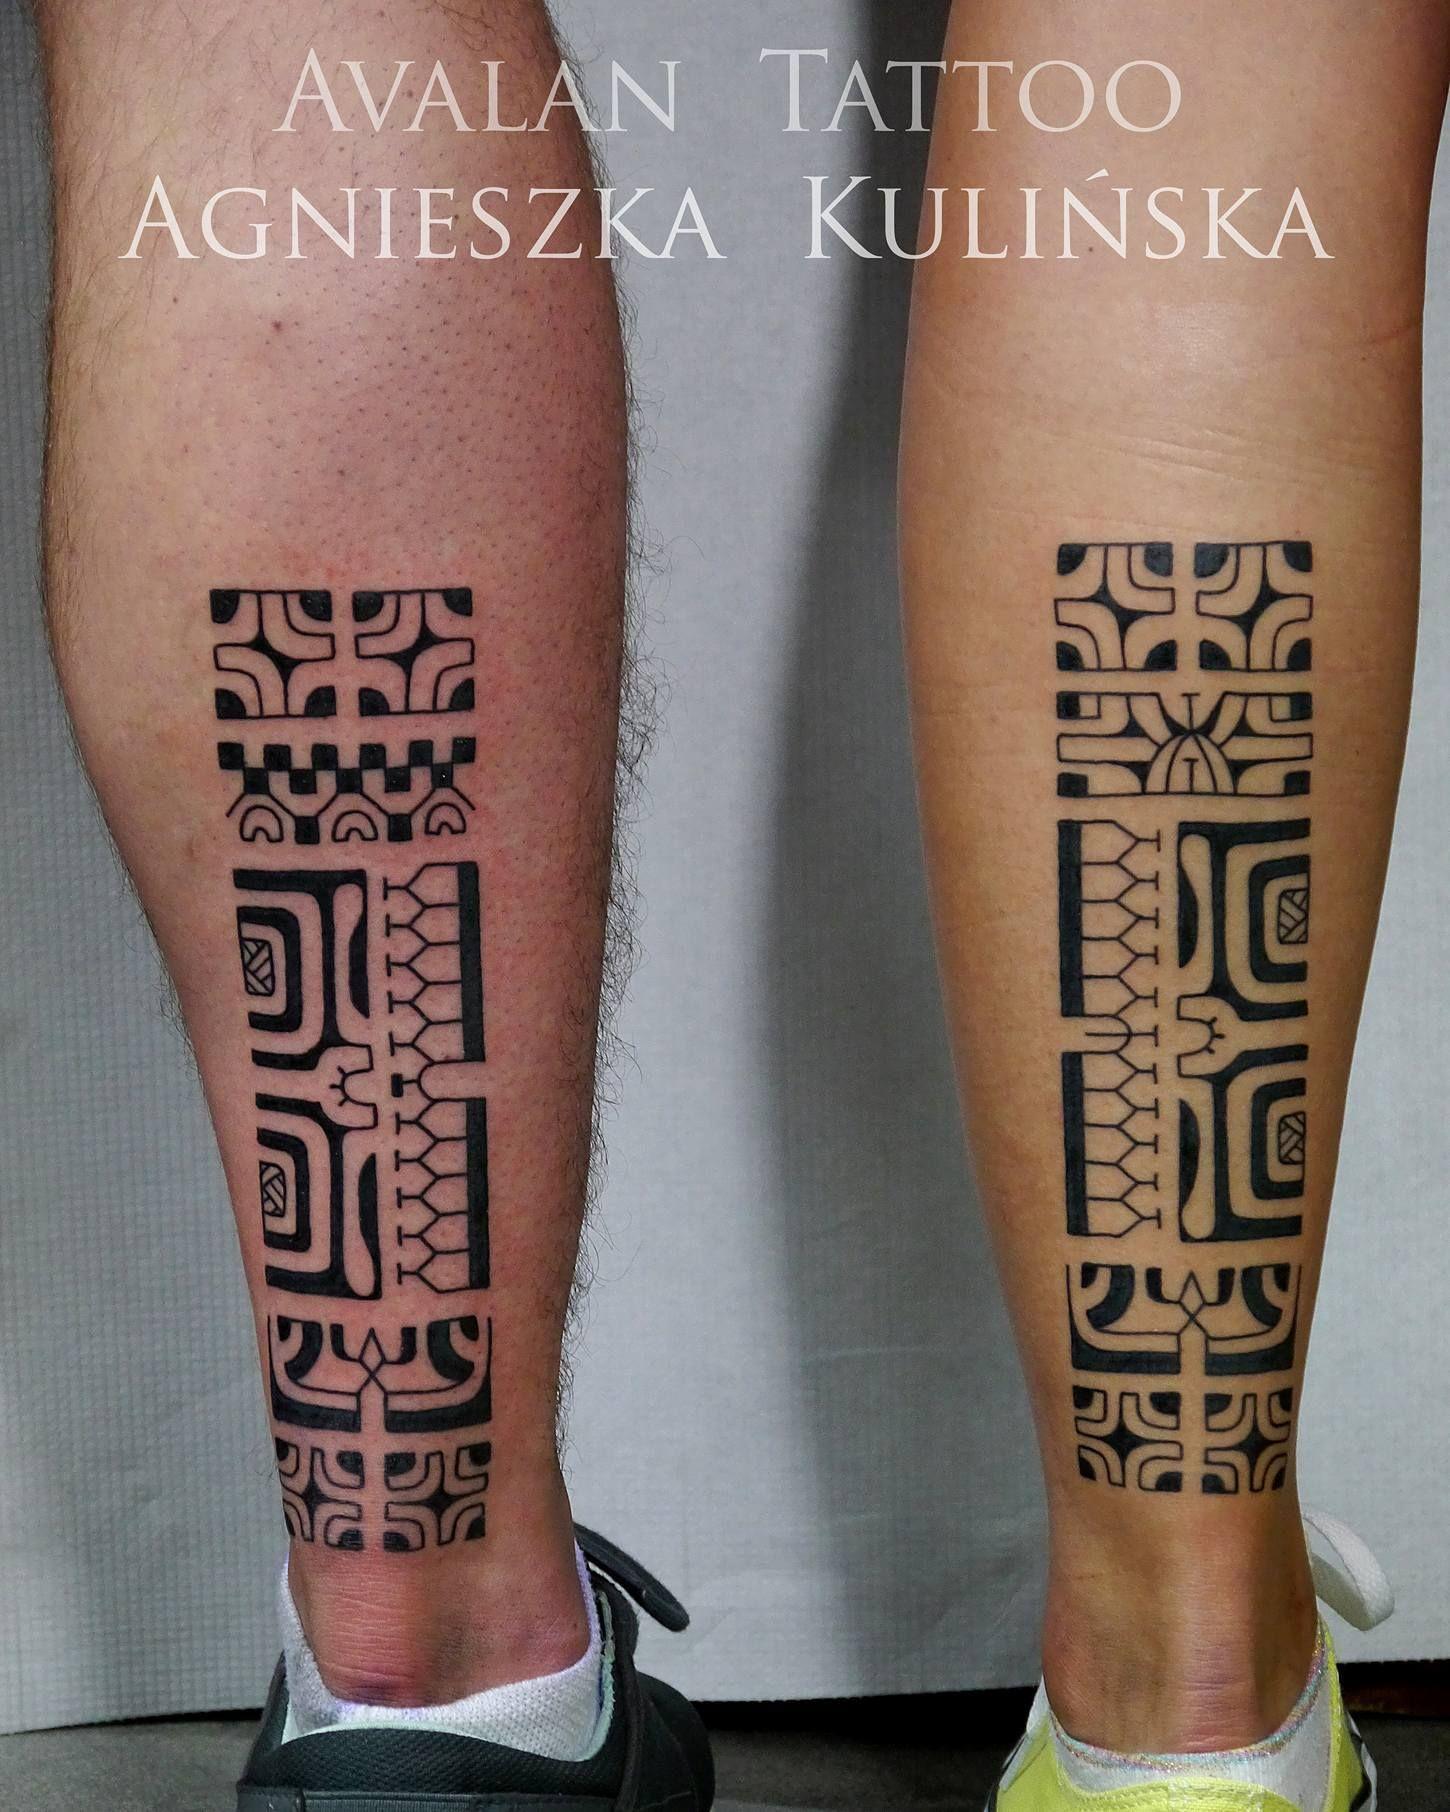 Polynesian Couple Tattoo Can Enclose Symbols Representing